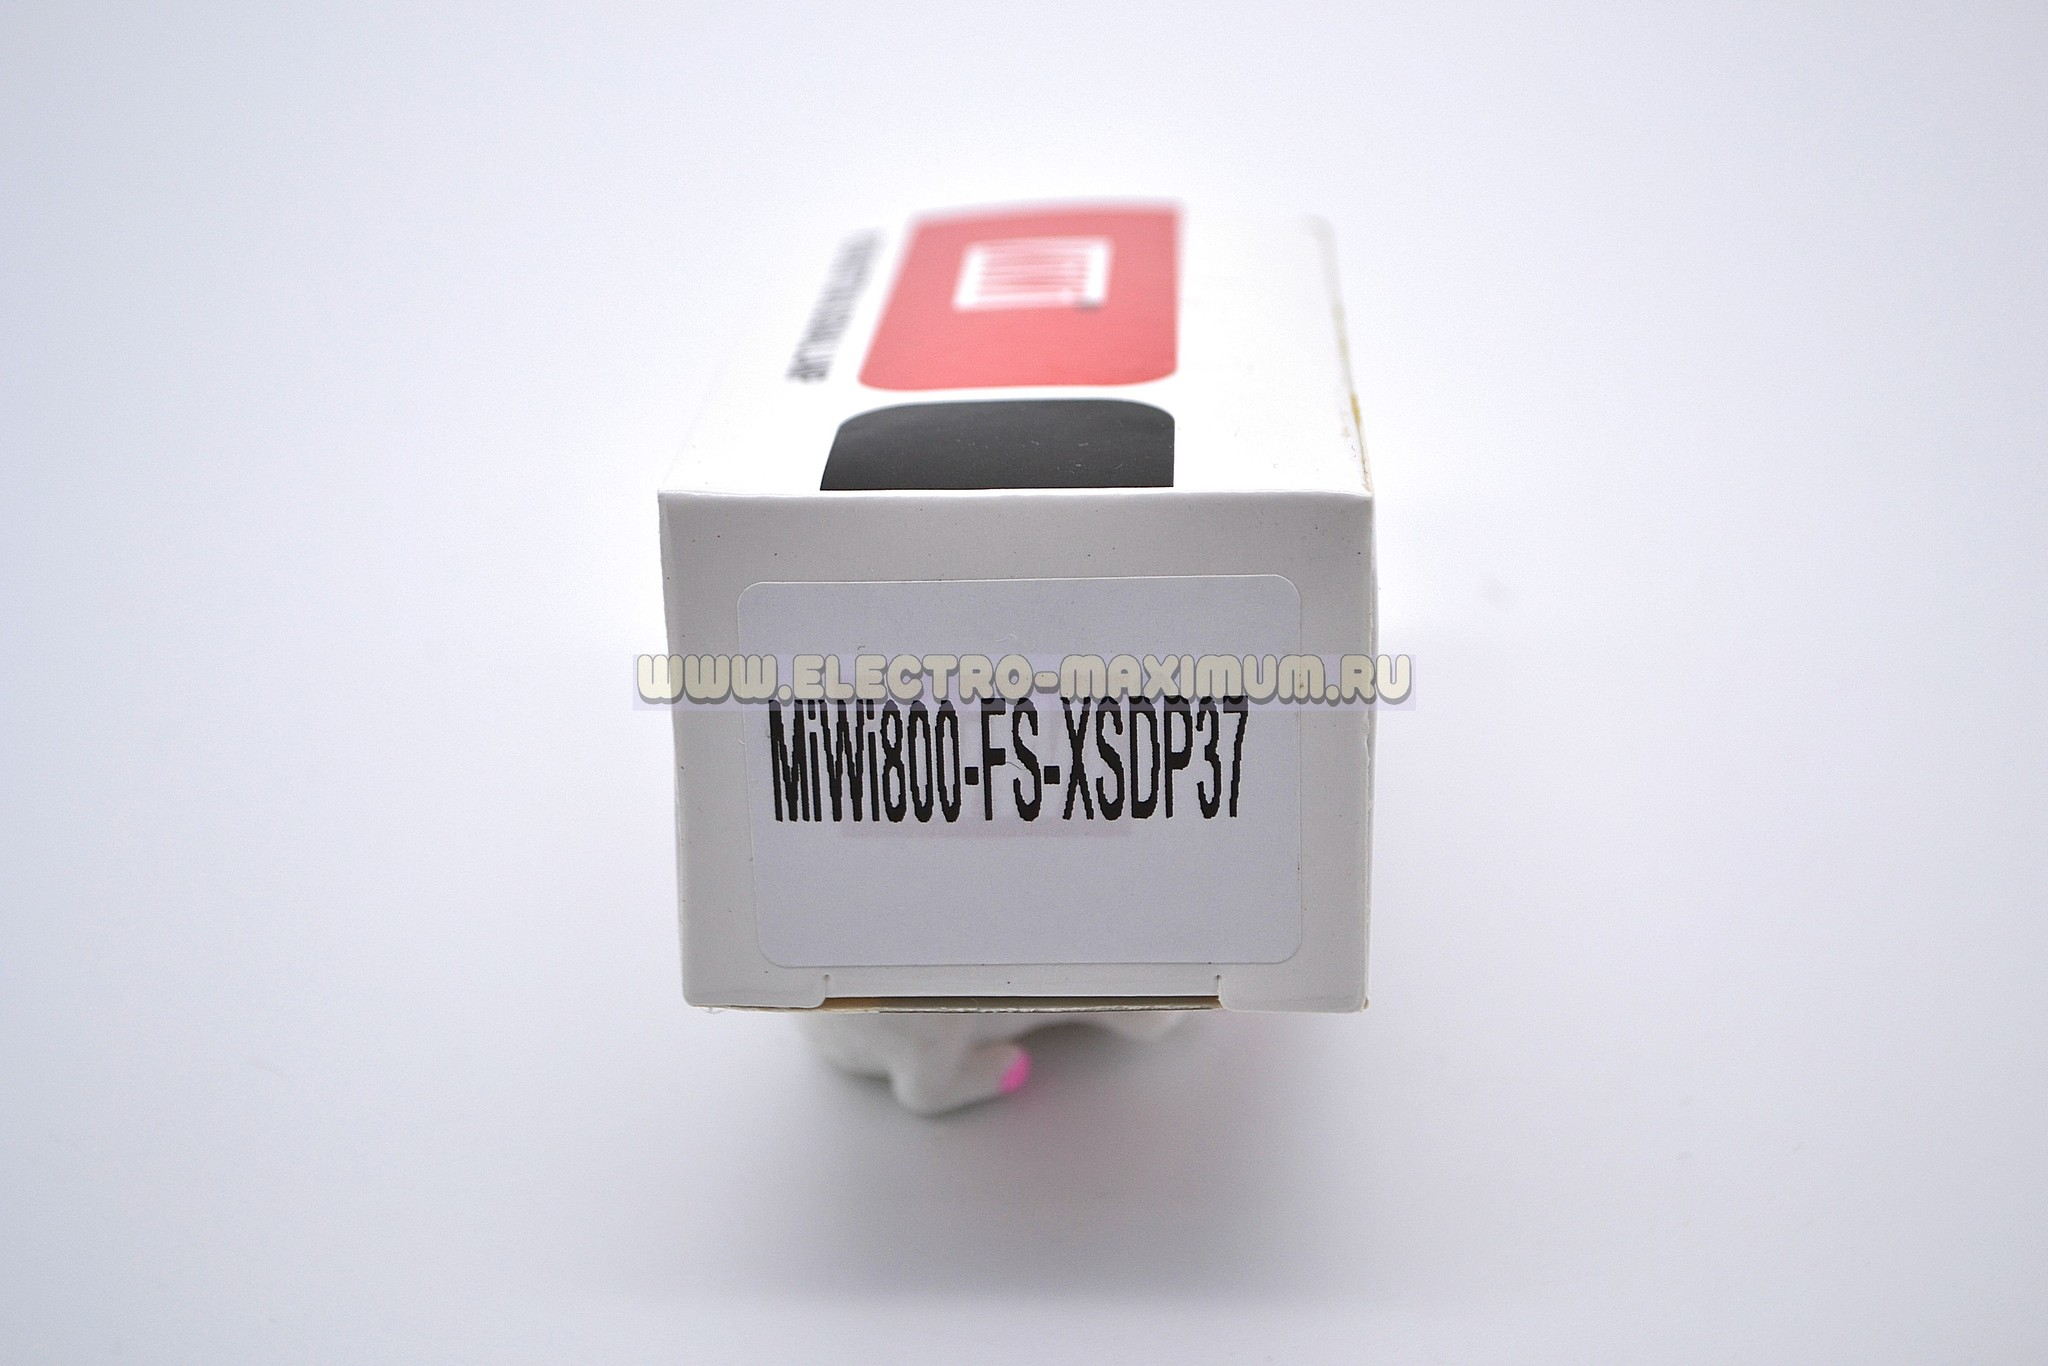 Переключатель MIWI800-FS-XSDP37  -  3 fixed P. 1NO 1NC